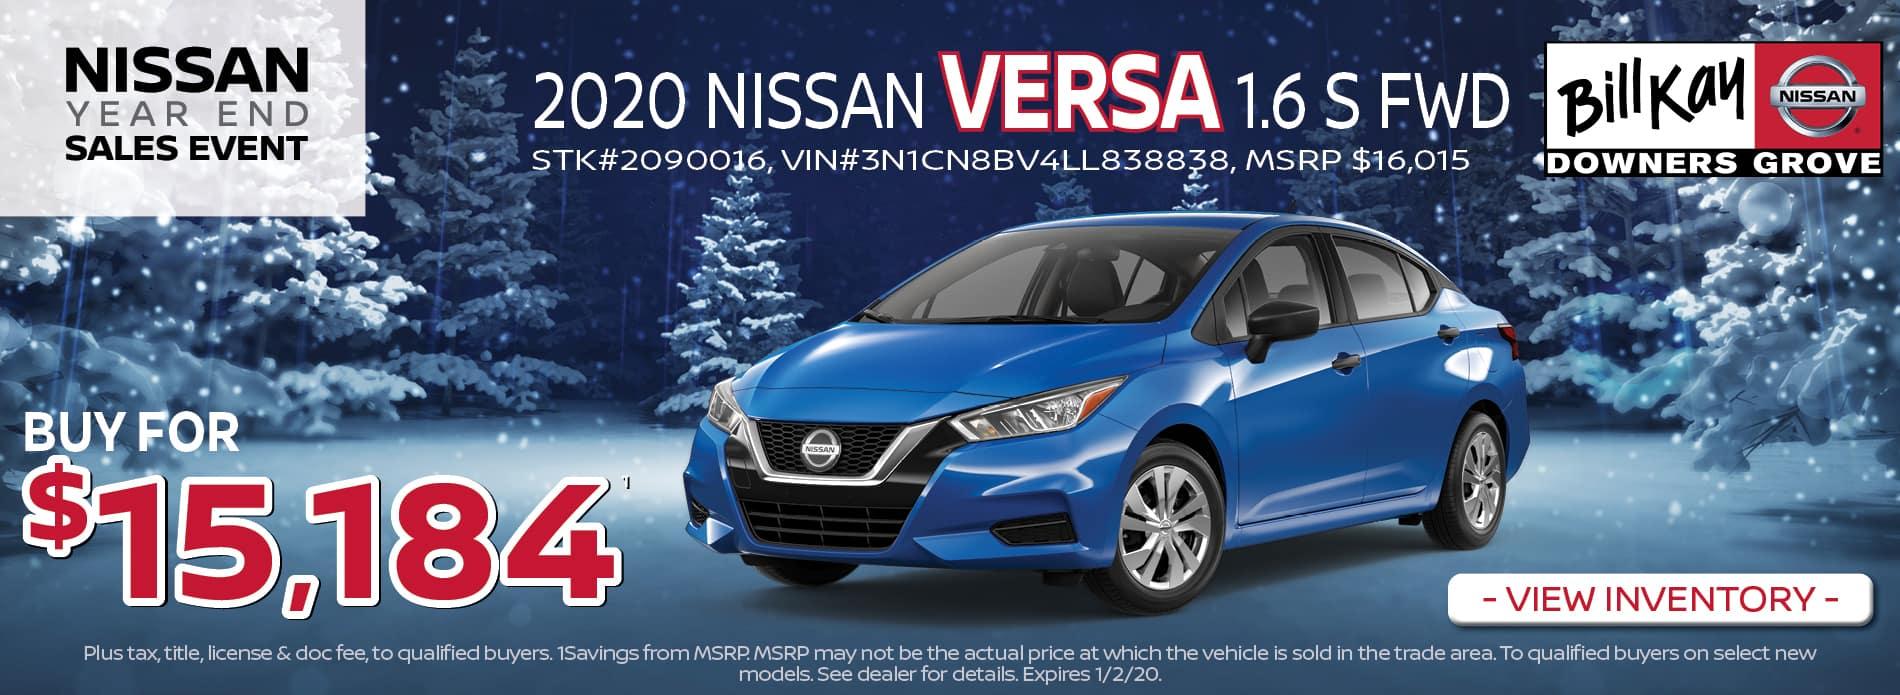 2020 Nissan Versa 1.6